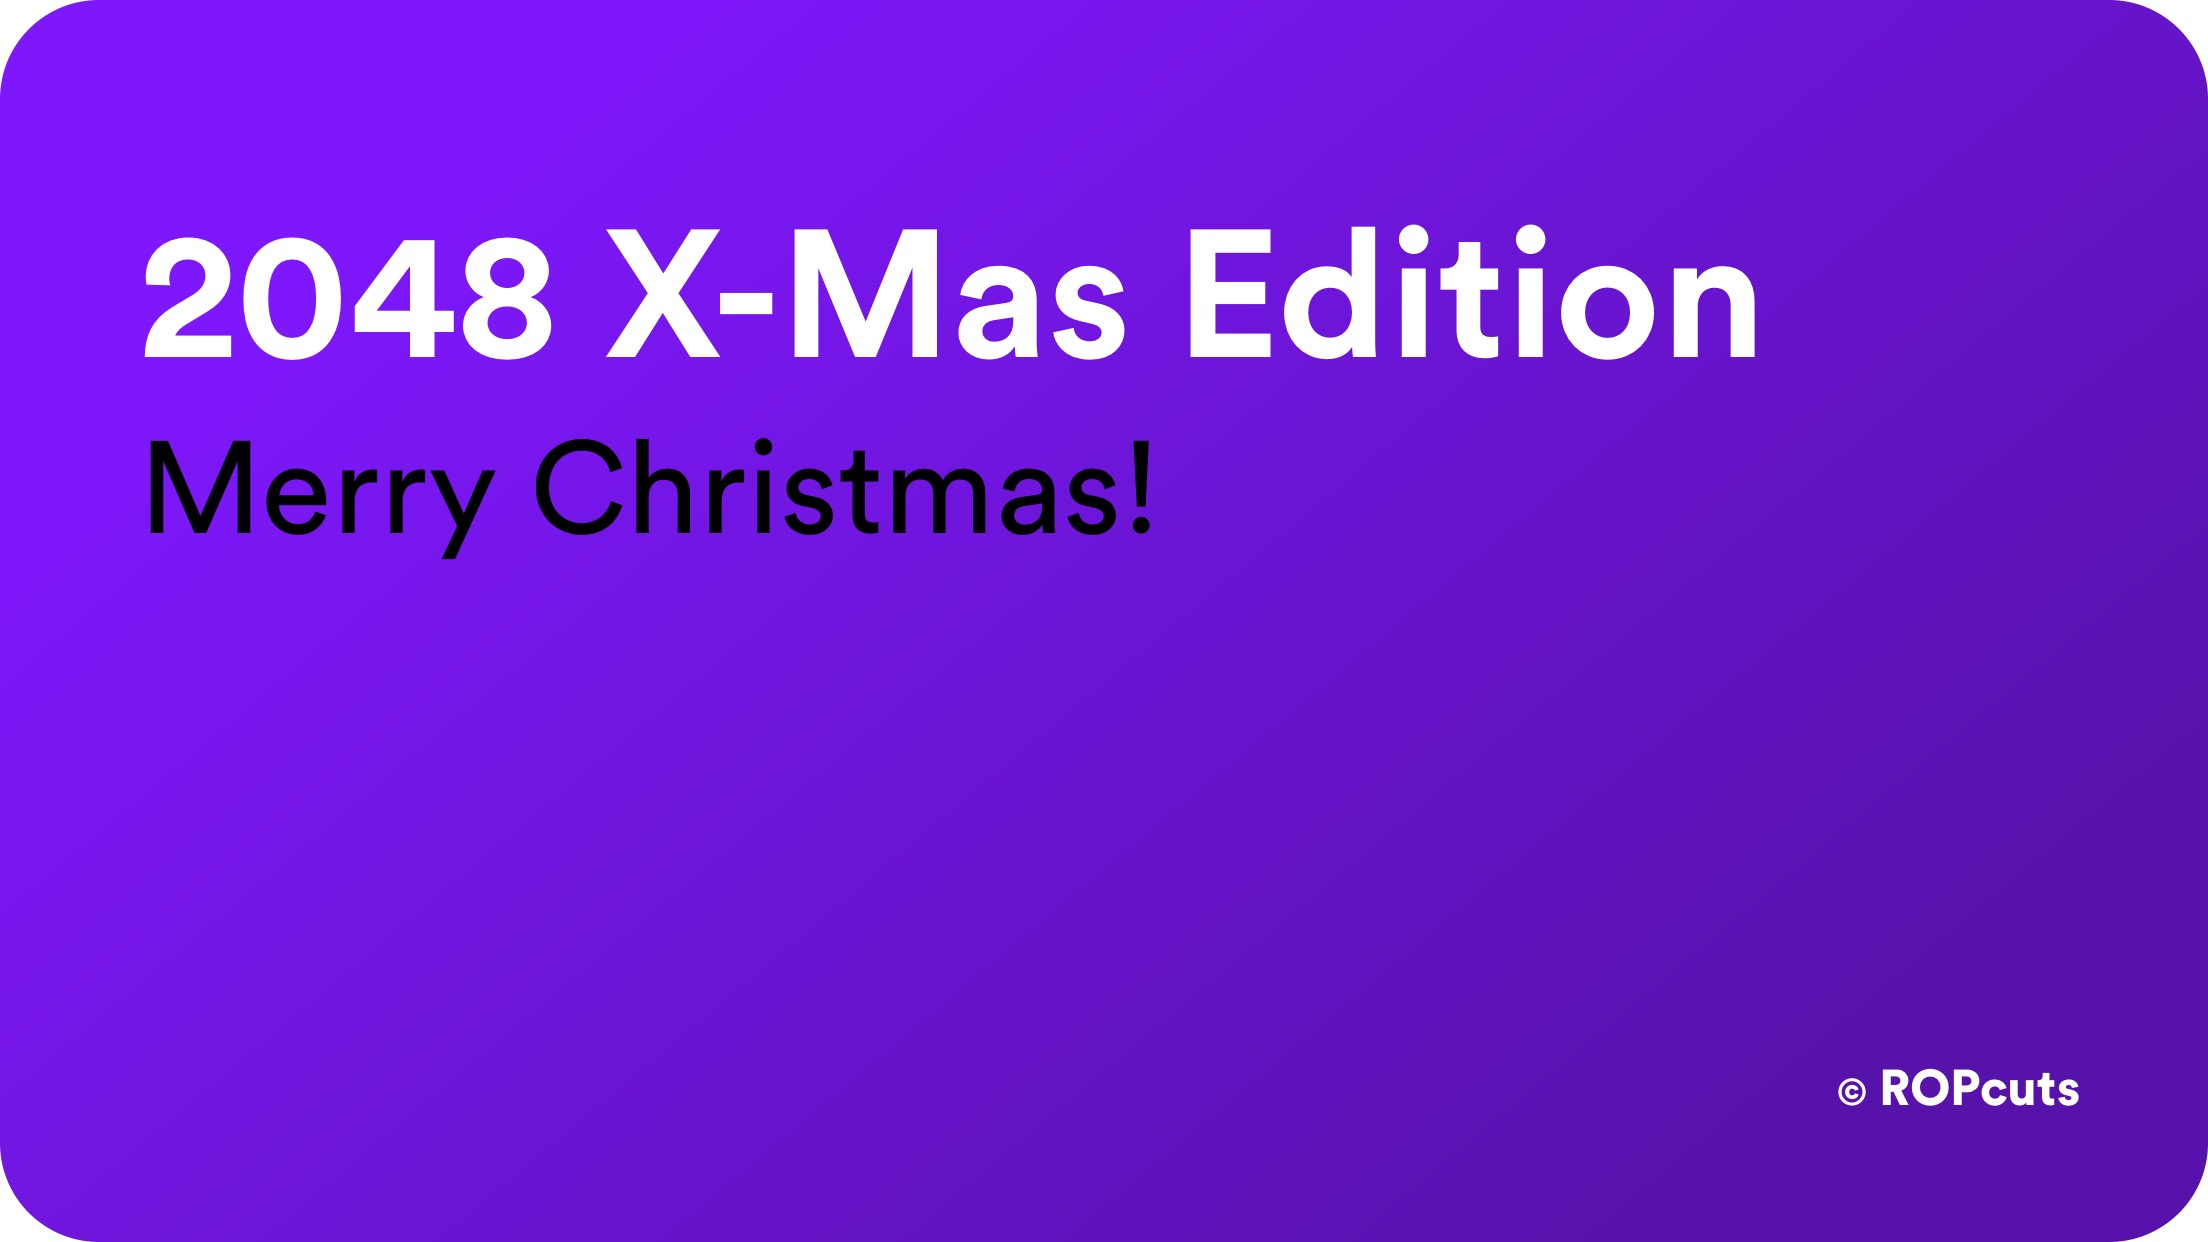 2048 X-Mas Edition